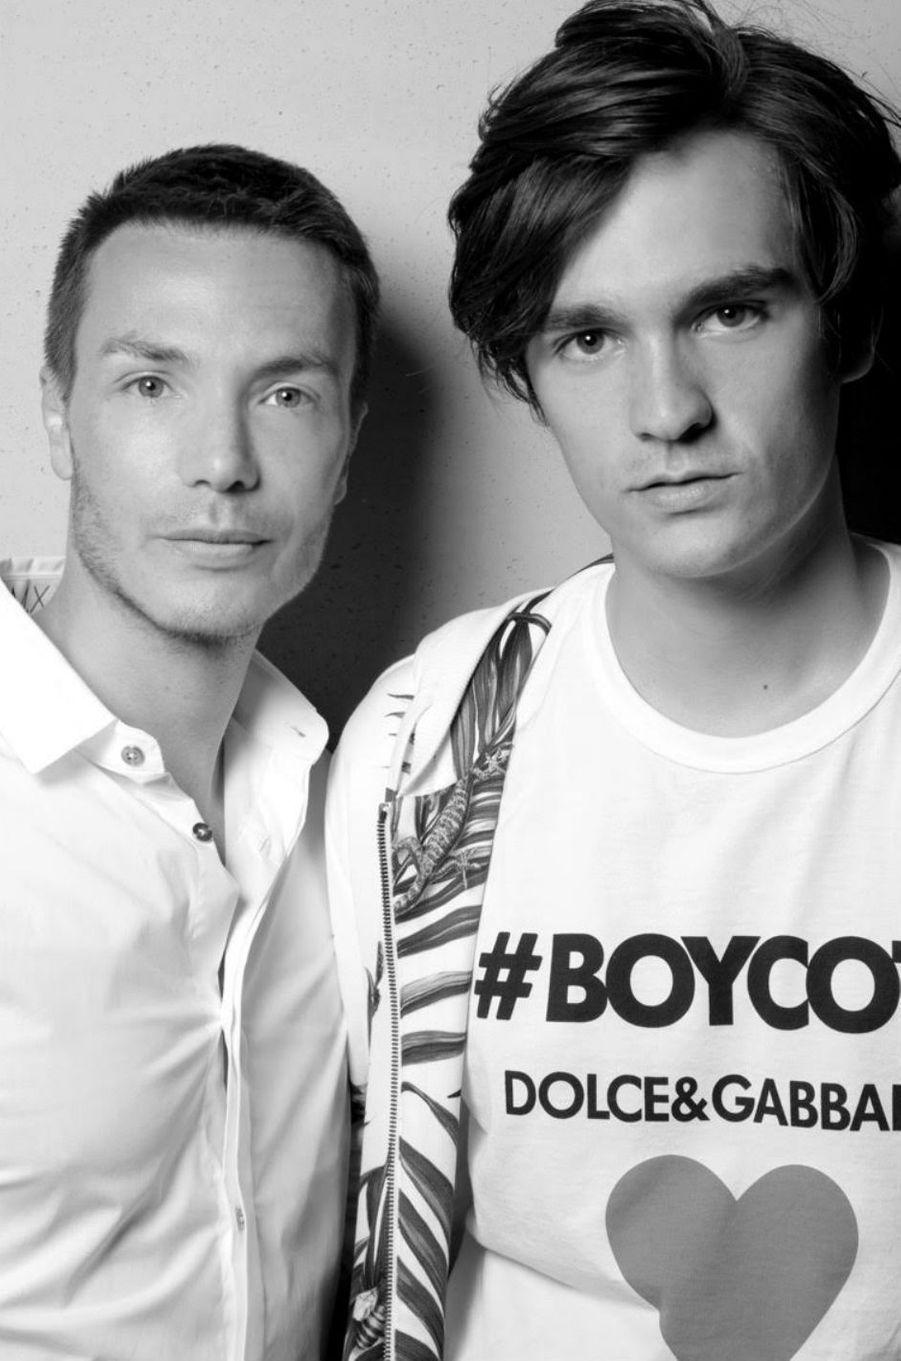 Maxime Simoens et Alain-Fabien Delon